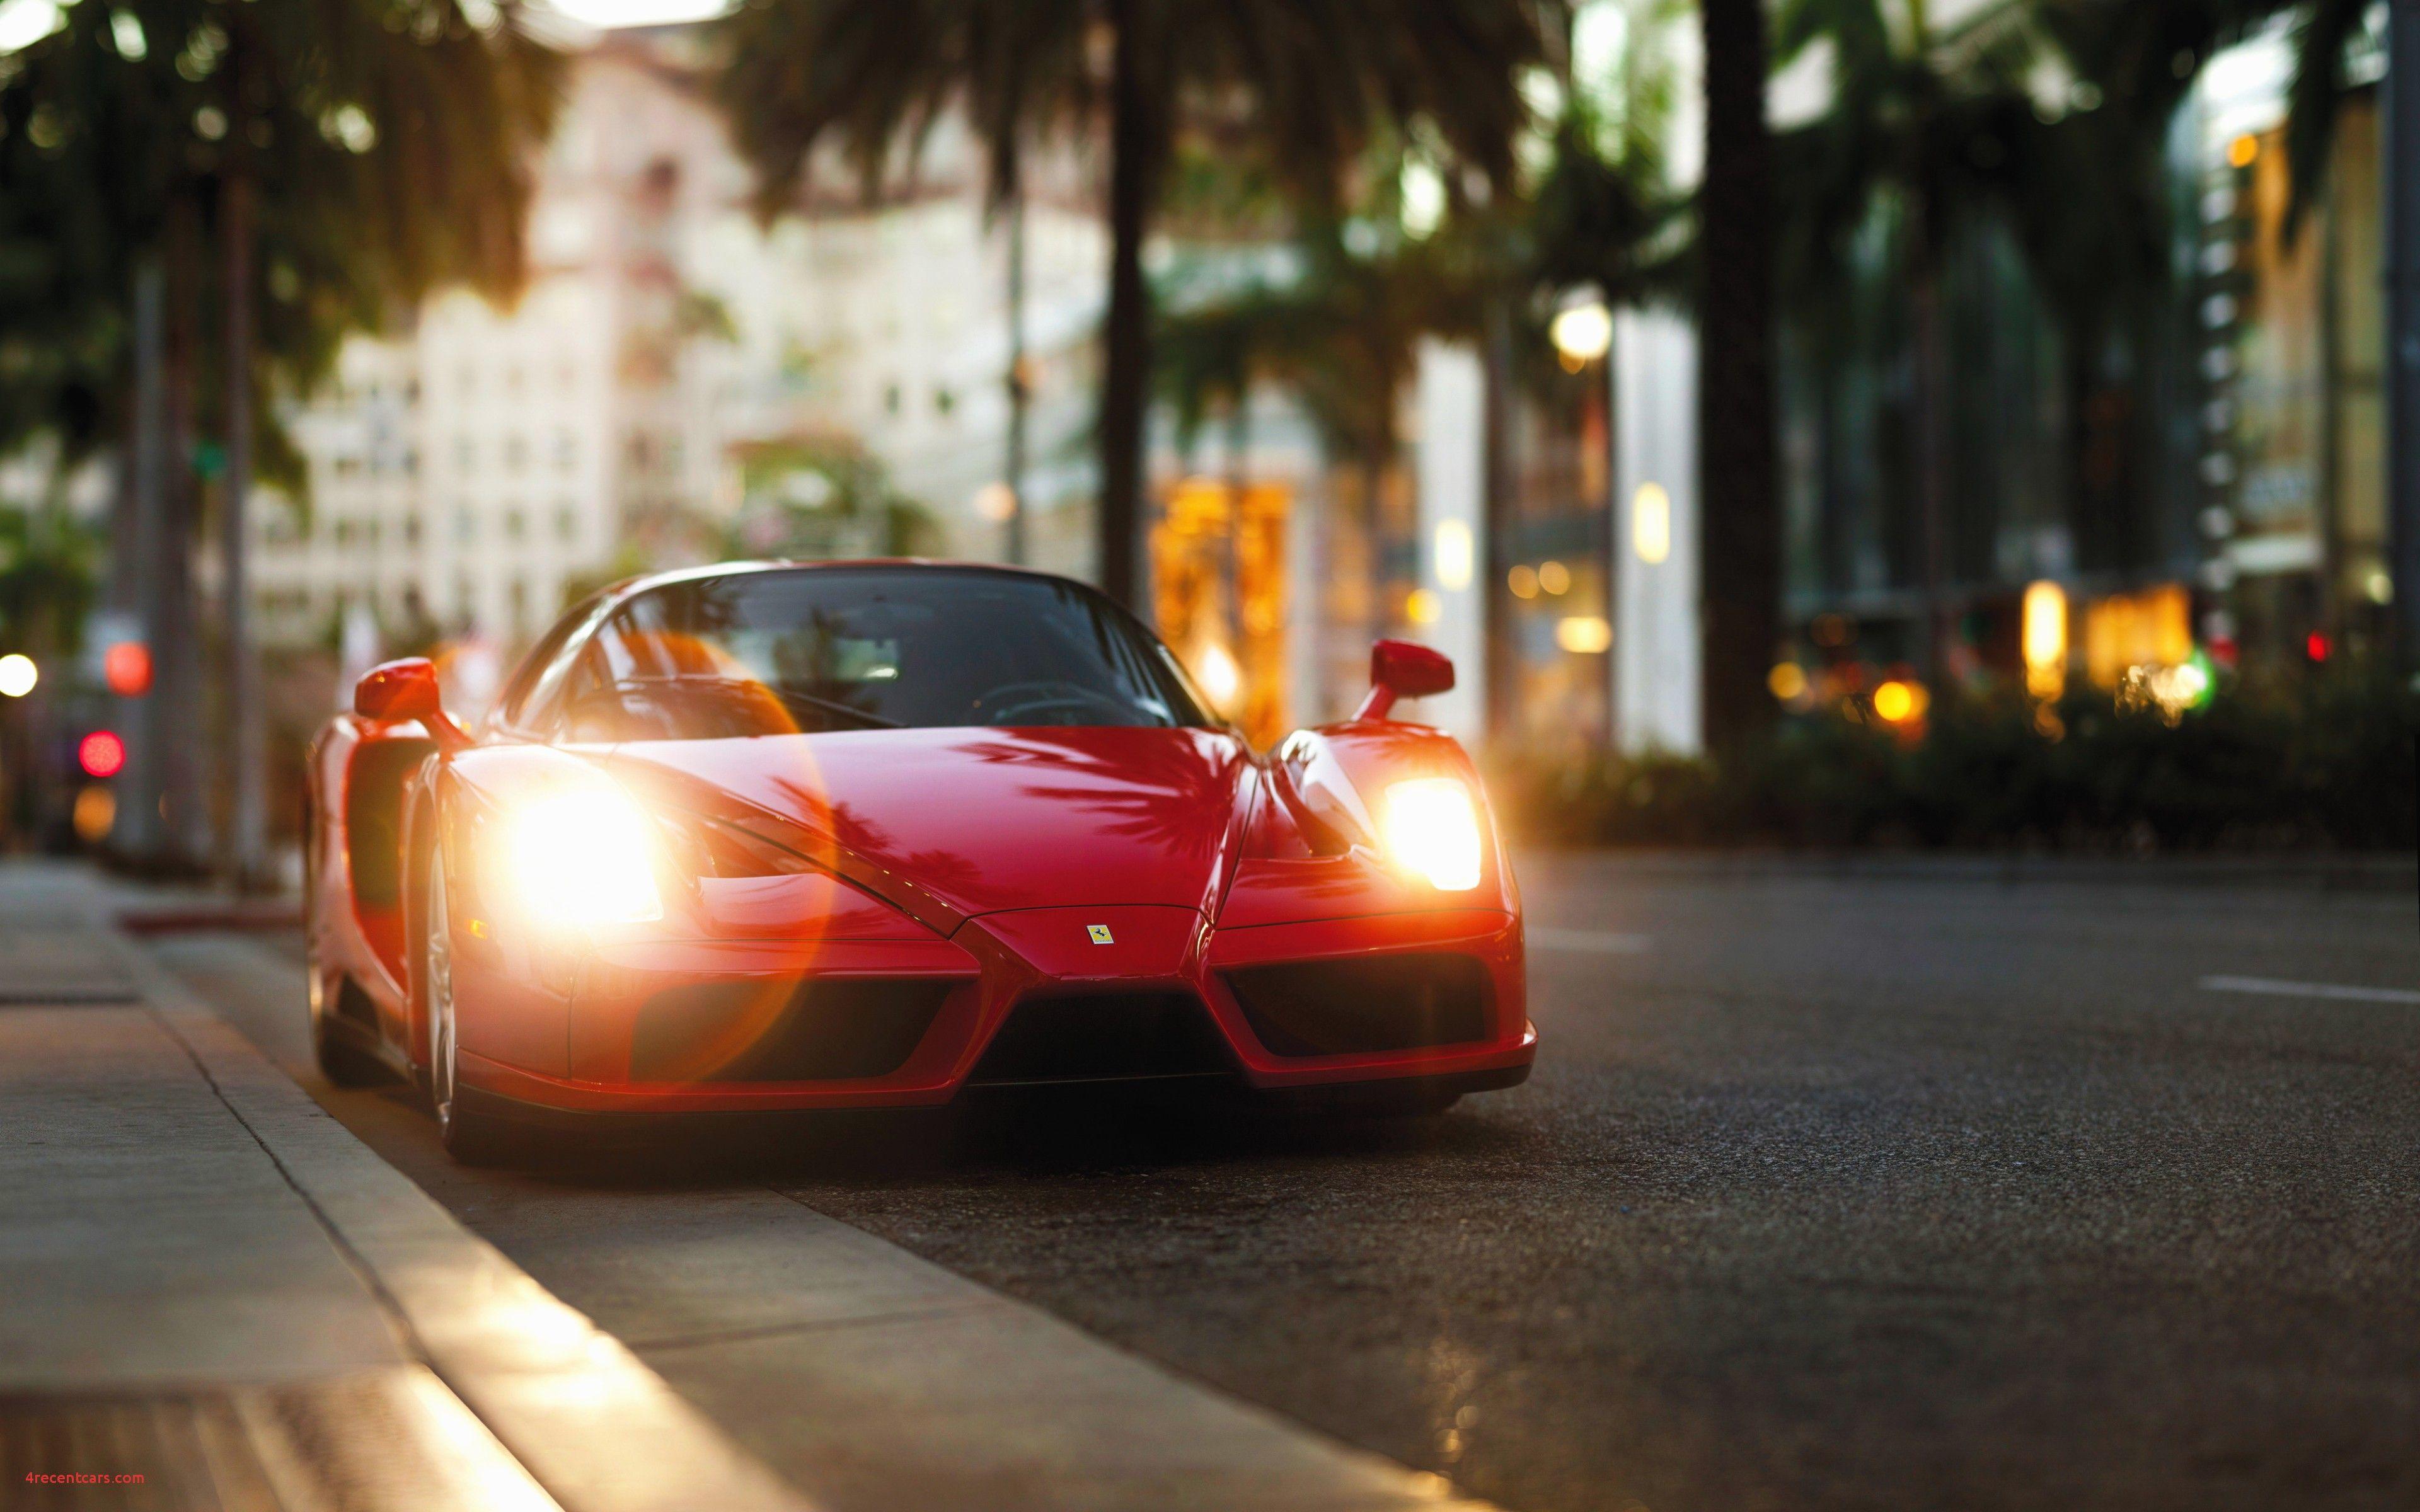 Car Ultra Hd 4k (#118772) - HD Wallpaper & Backgrounds Download